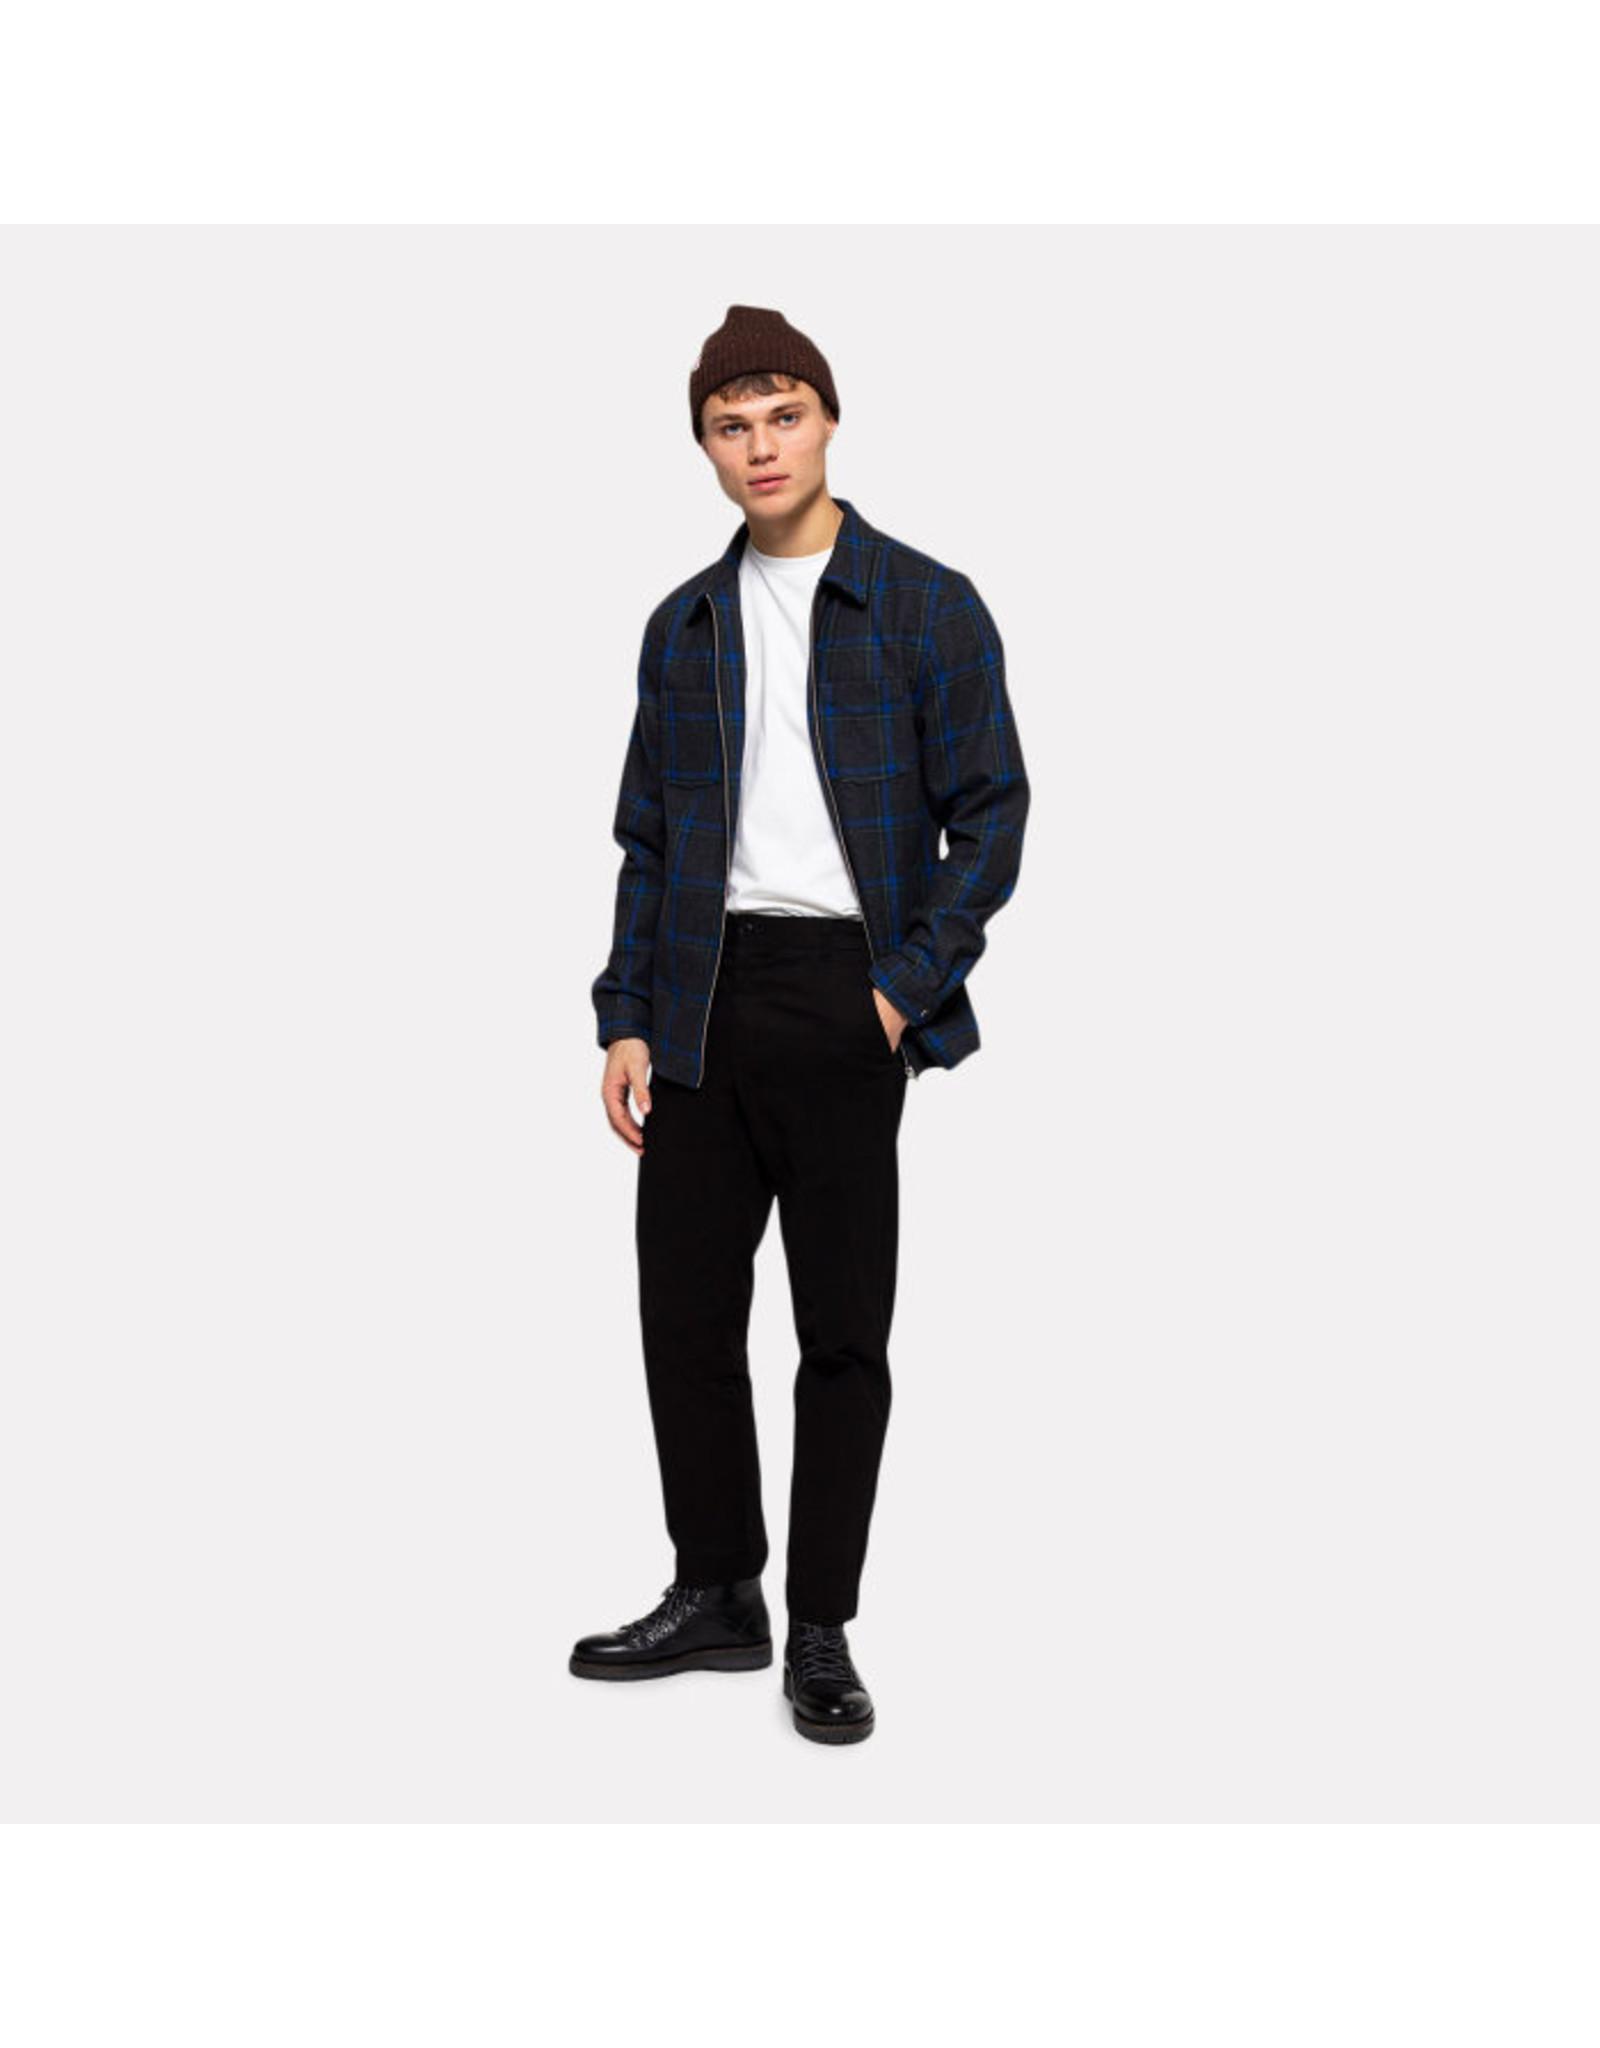 RVLT 3792 Flannel Shirt Jacket - Navy